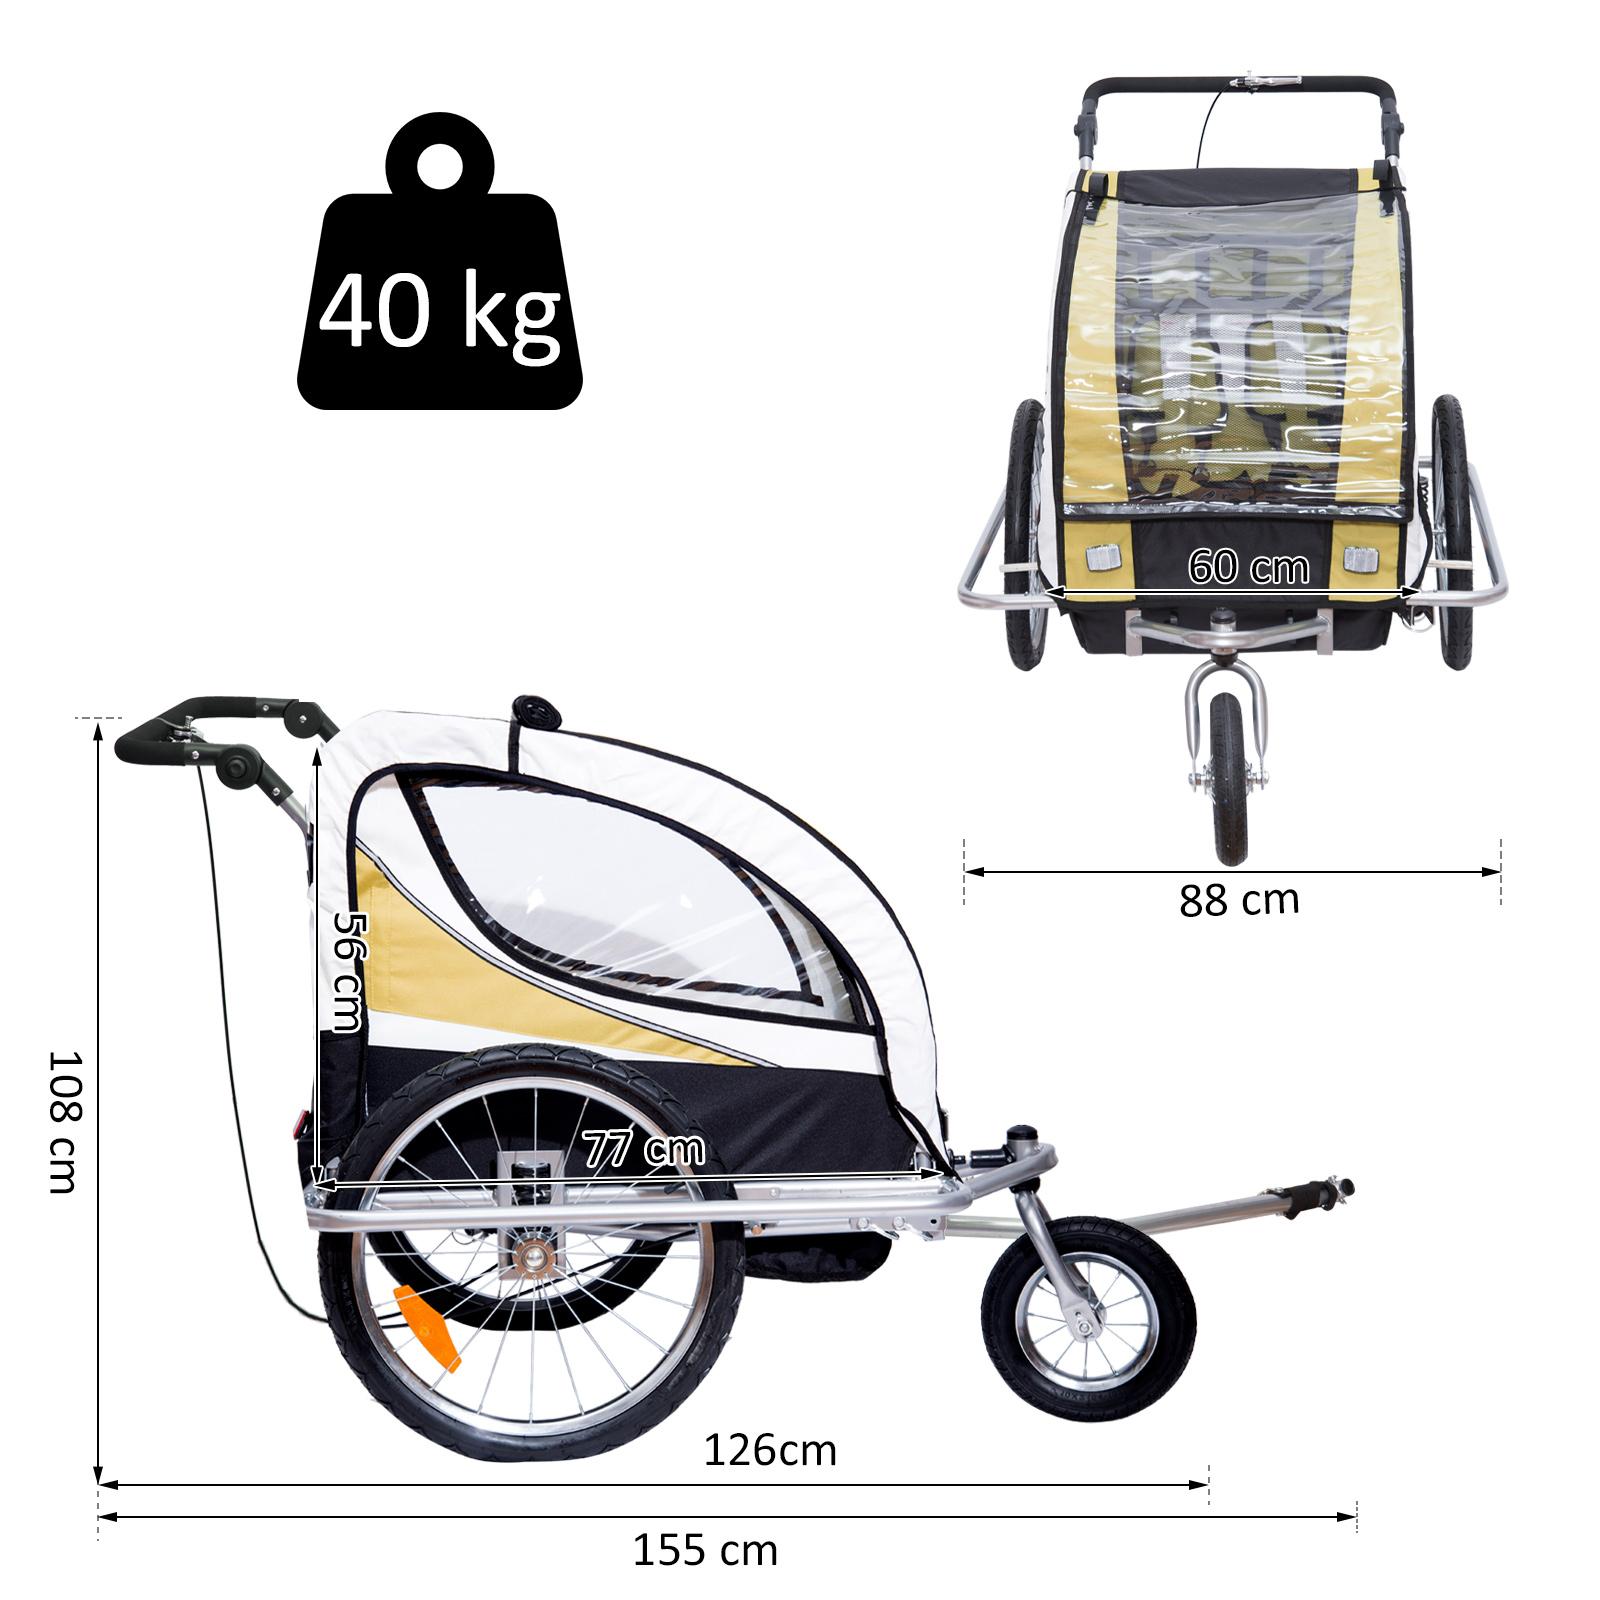 miniatura 8 - Remolque para Bicicleta tipo Carro con Barra de Paseo para Niños de 2 Plazas NUE